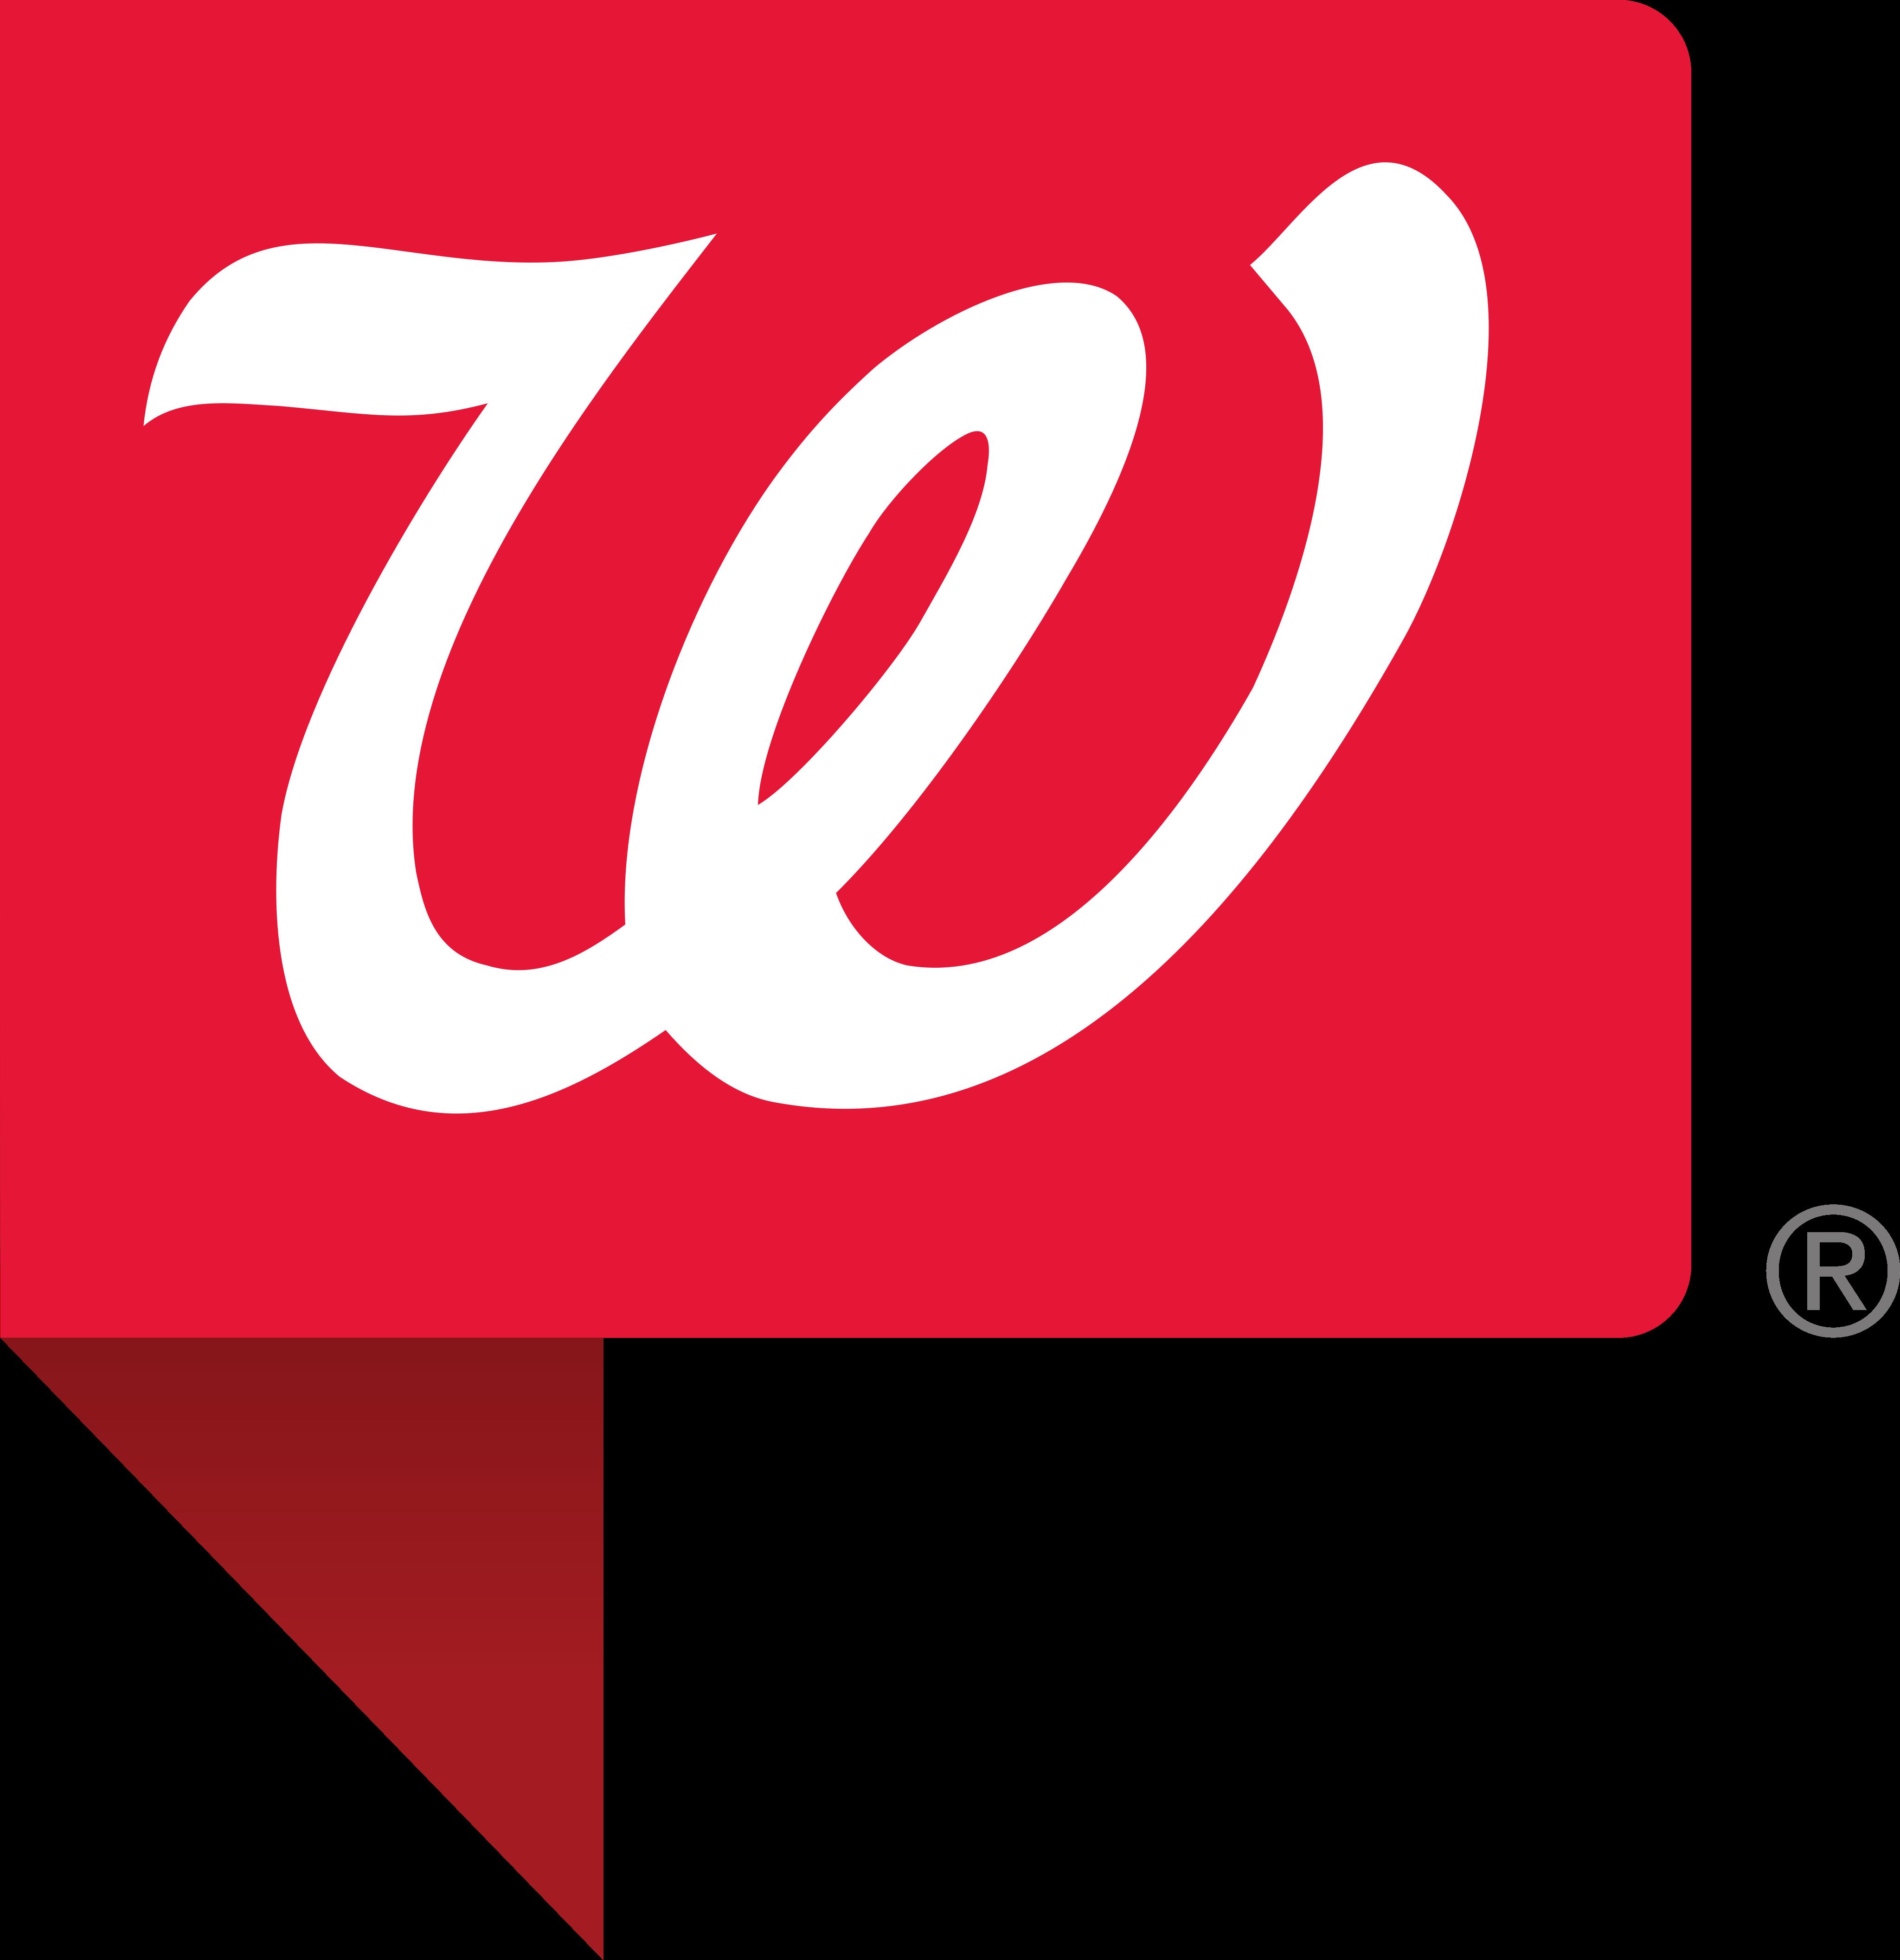 walgreens logo 1 - Walgreens Logo